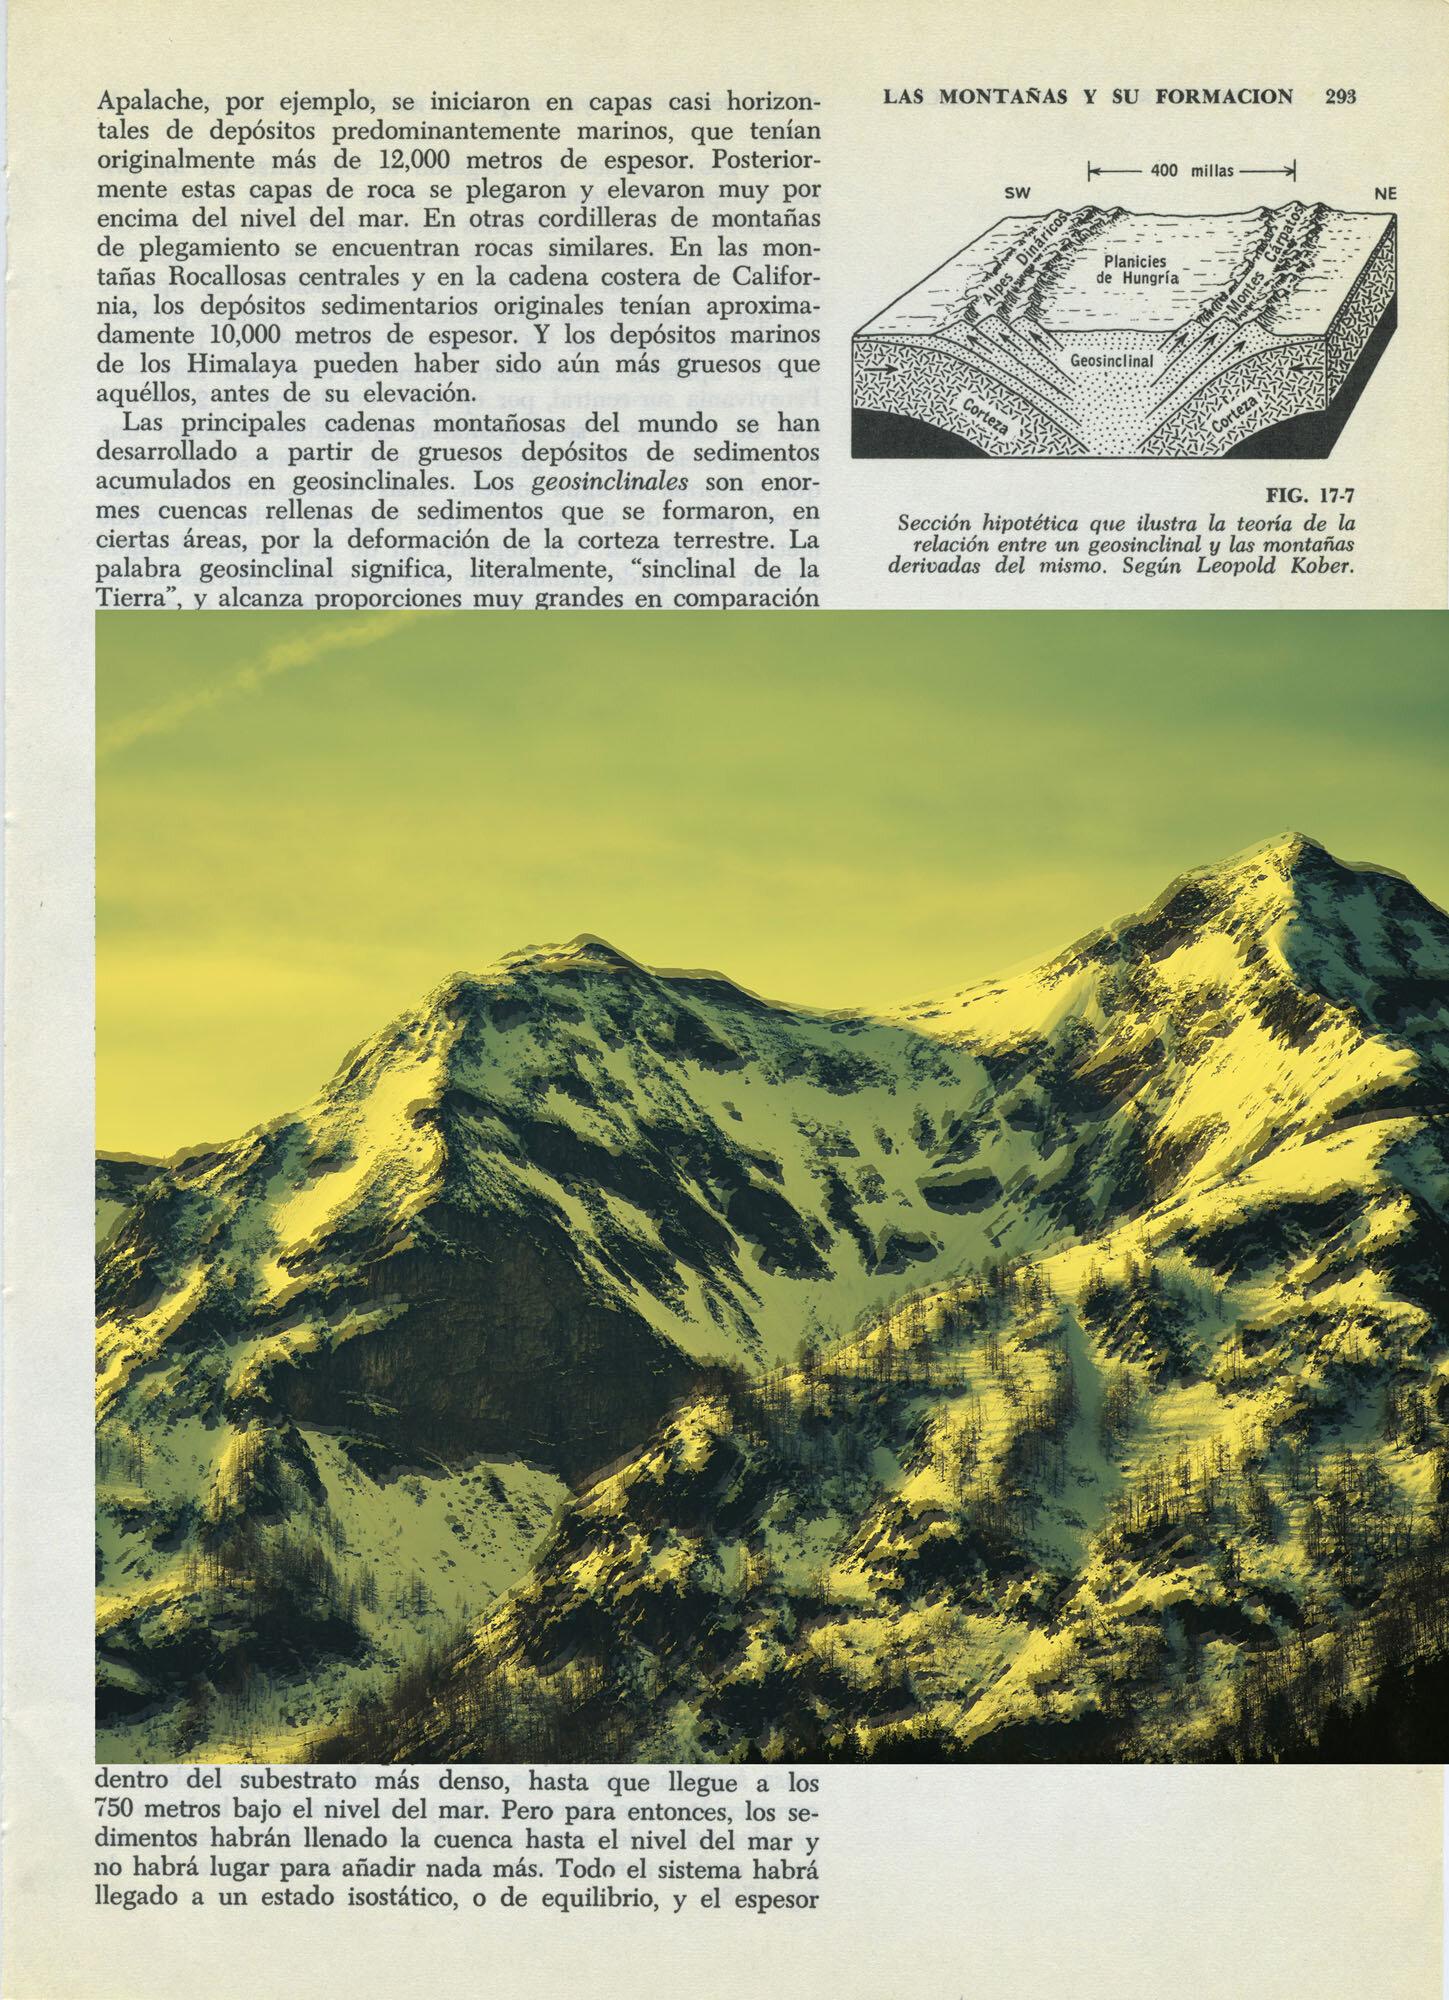 190205 NoA MountainFormation 4.jpg